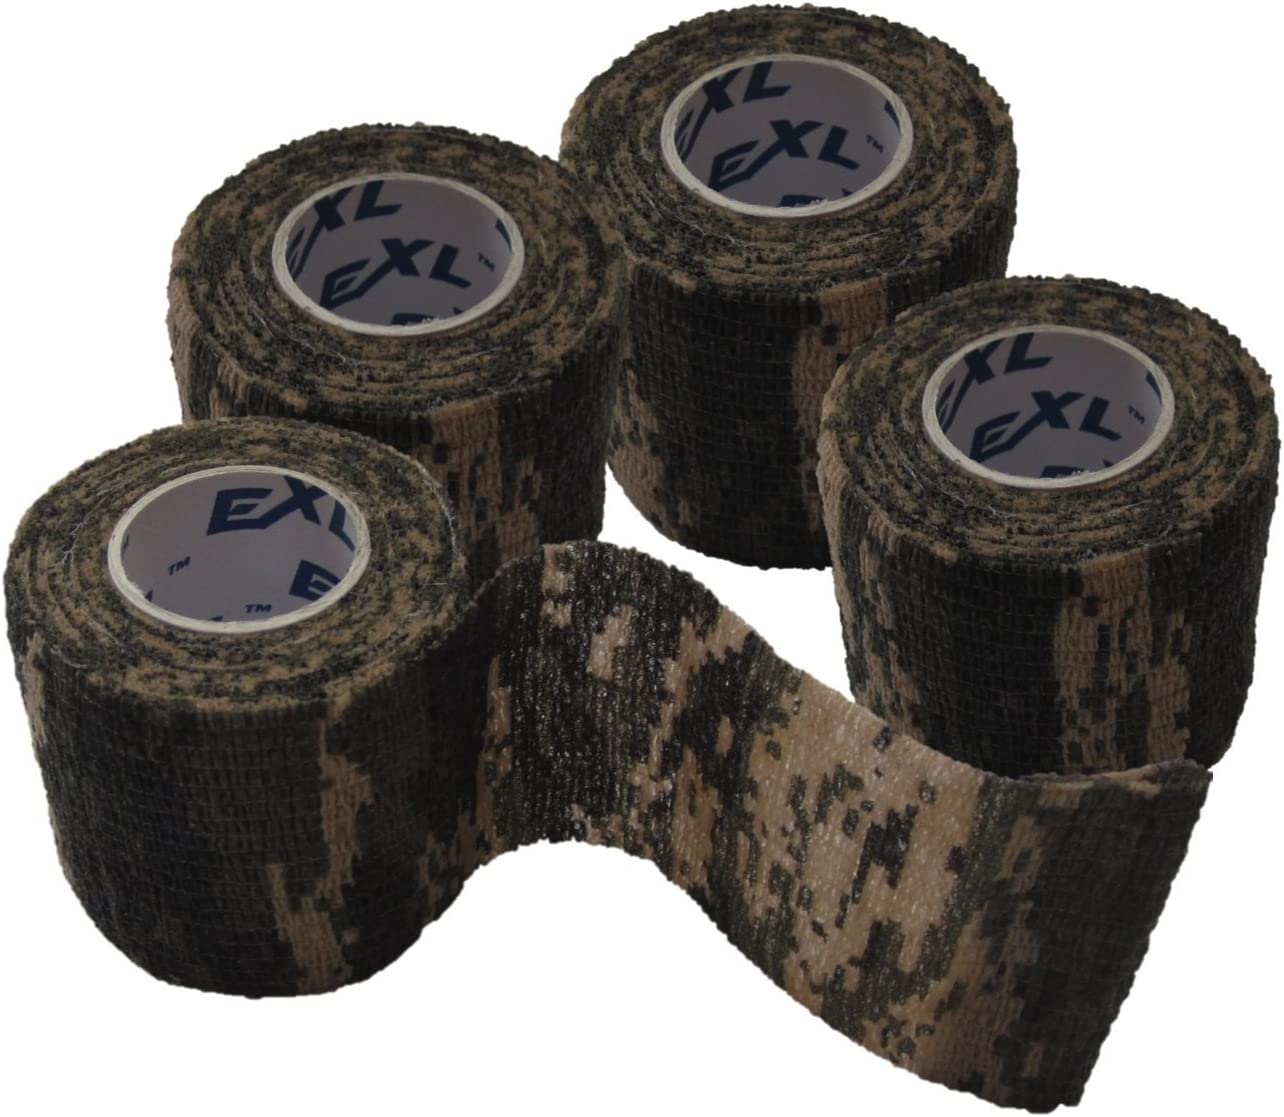 2x 4.5M Military Stretch Medical Bandage Camouflage Tape Self-Adhesiv Gun Decor/&